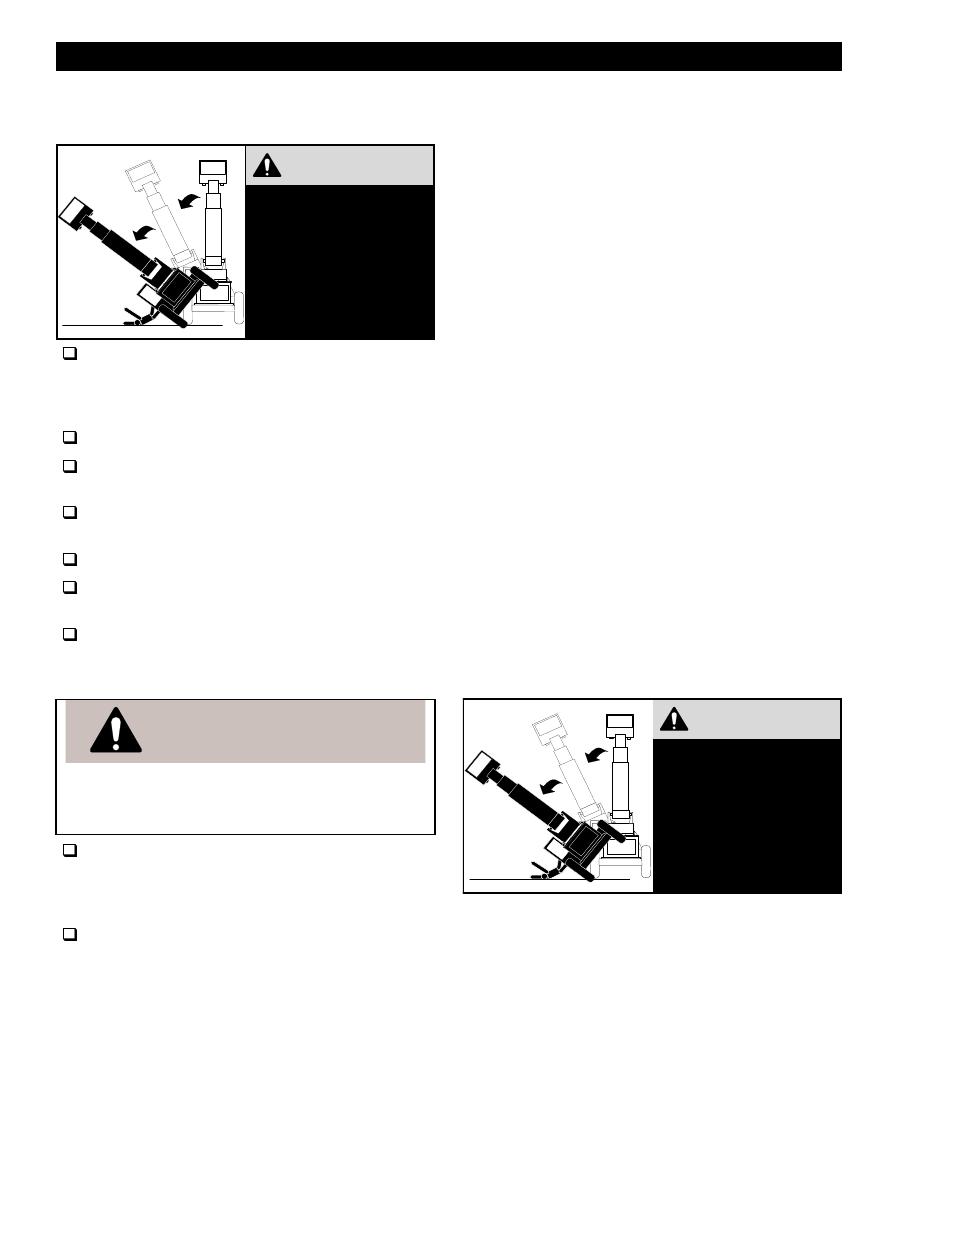 Warning, General operating procedures | Lull 644B Operation Manual User  Manual | Page 26 / 42